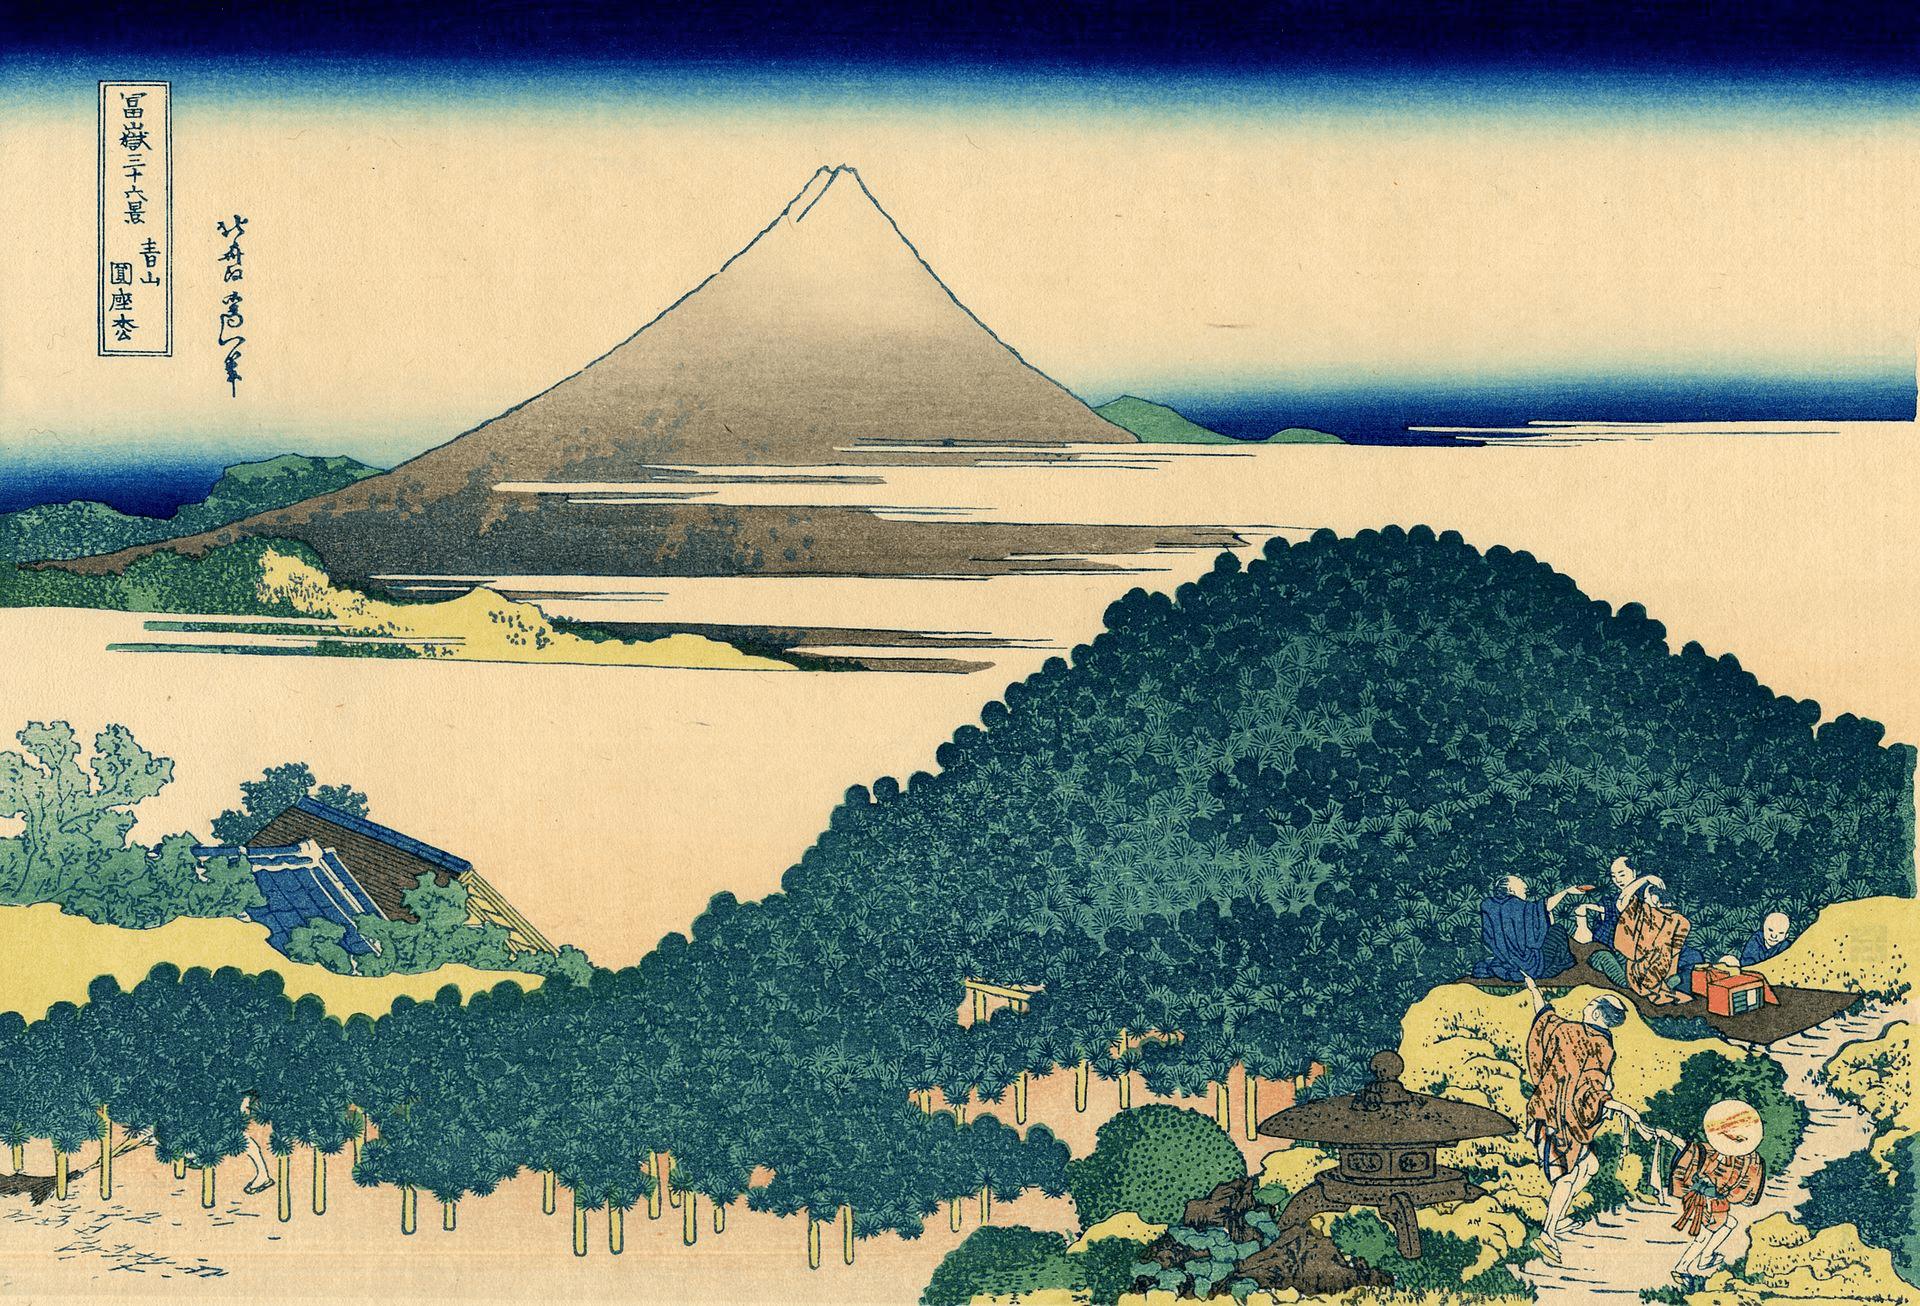 Images of Mount Fuji | VolcanoCafe